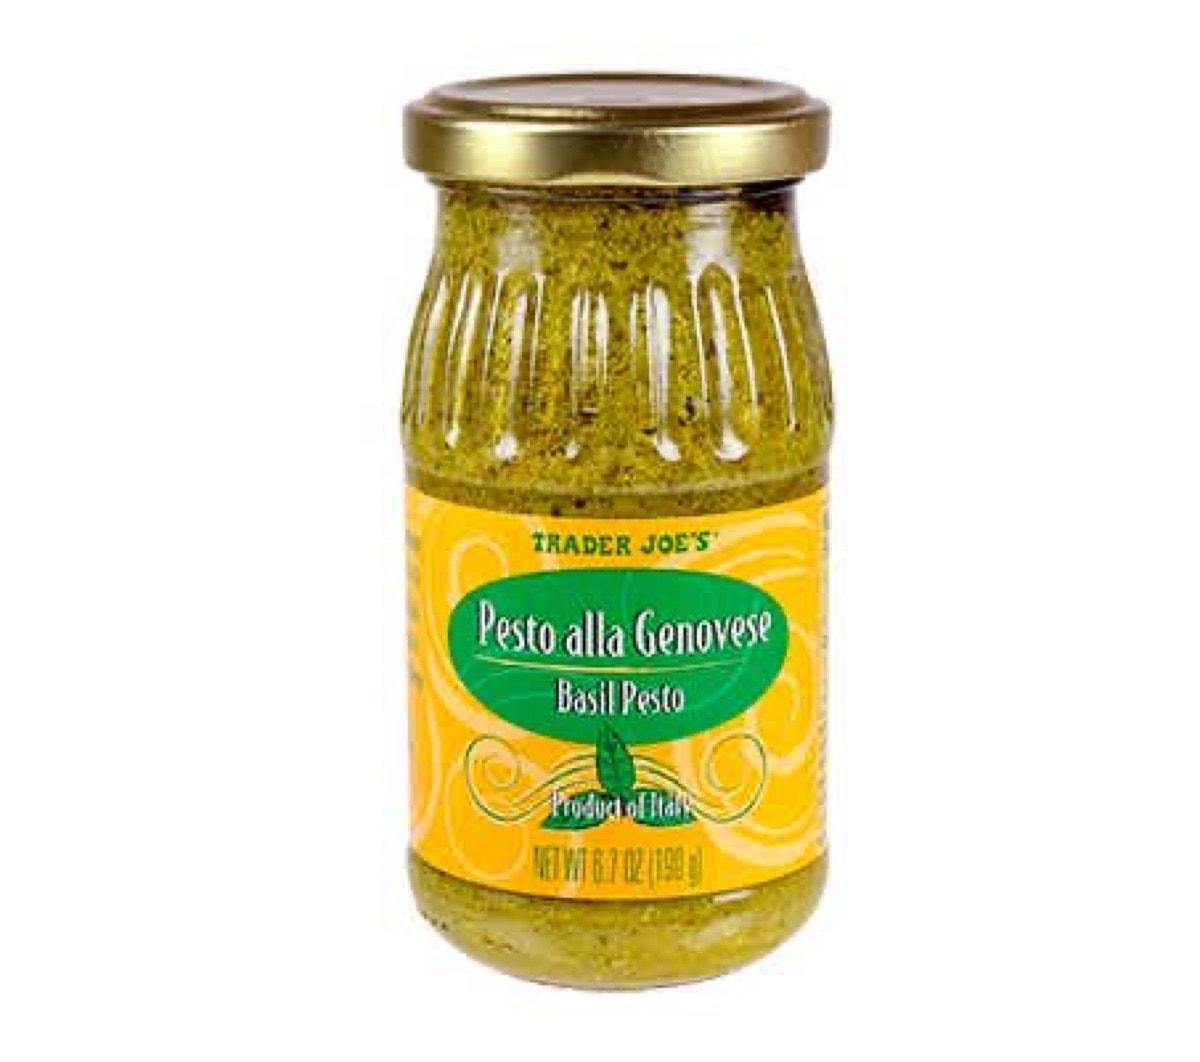 Trader Joe's Pesto alla Genovese